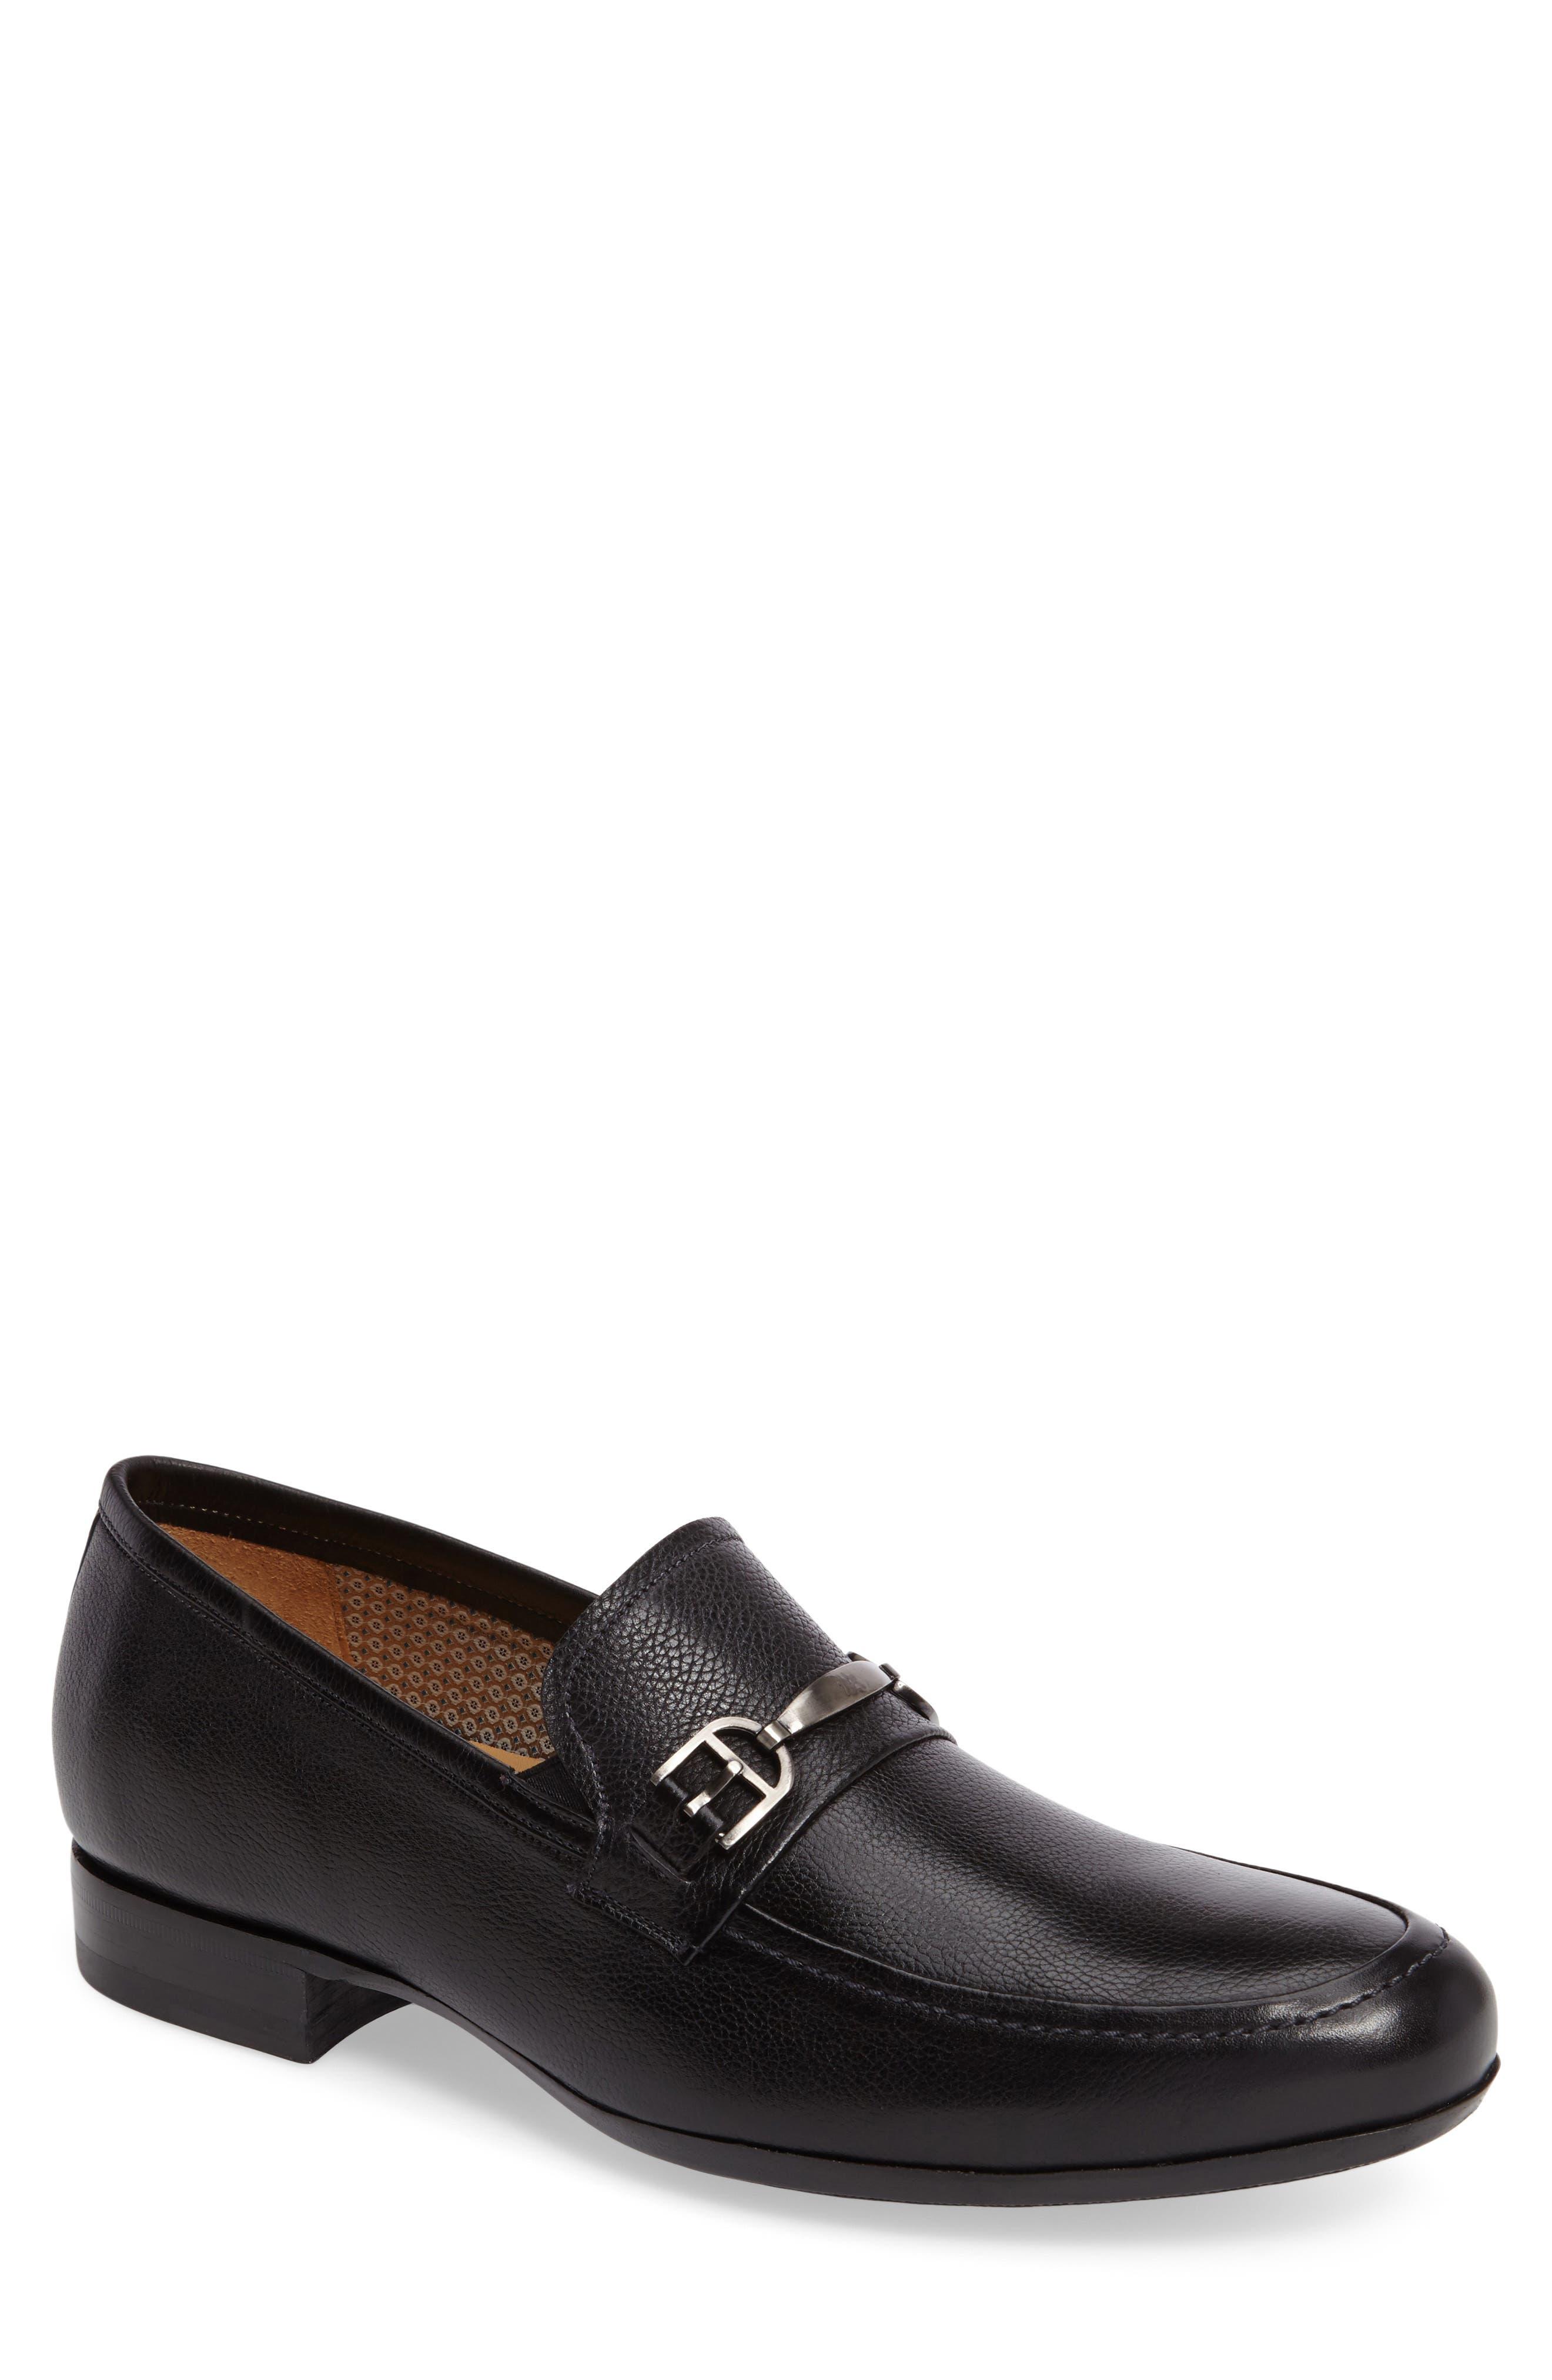 Binet Bit Loafer,                             Main thumbnail 1, color,                             Black Leather